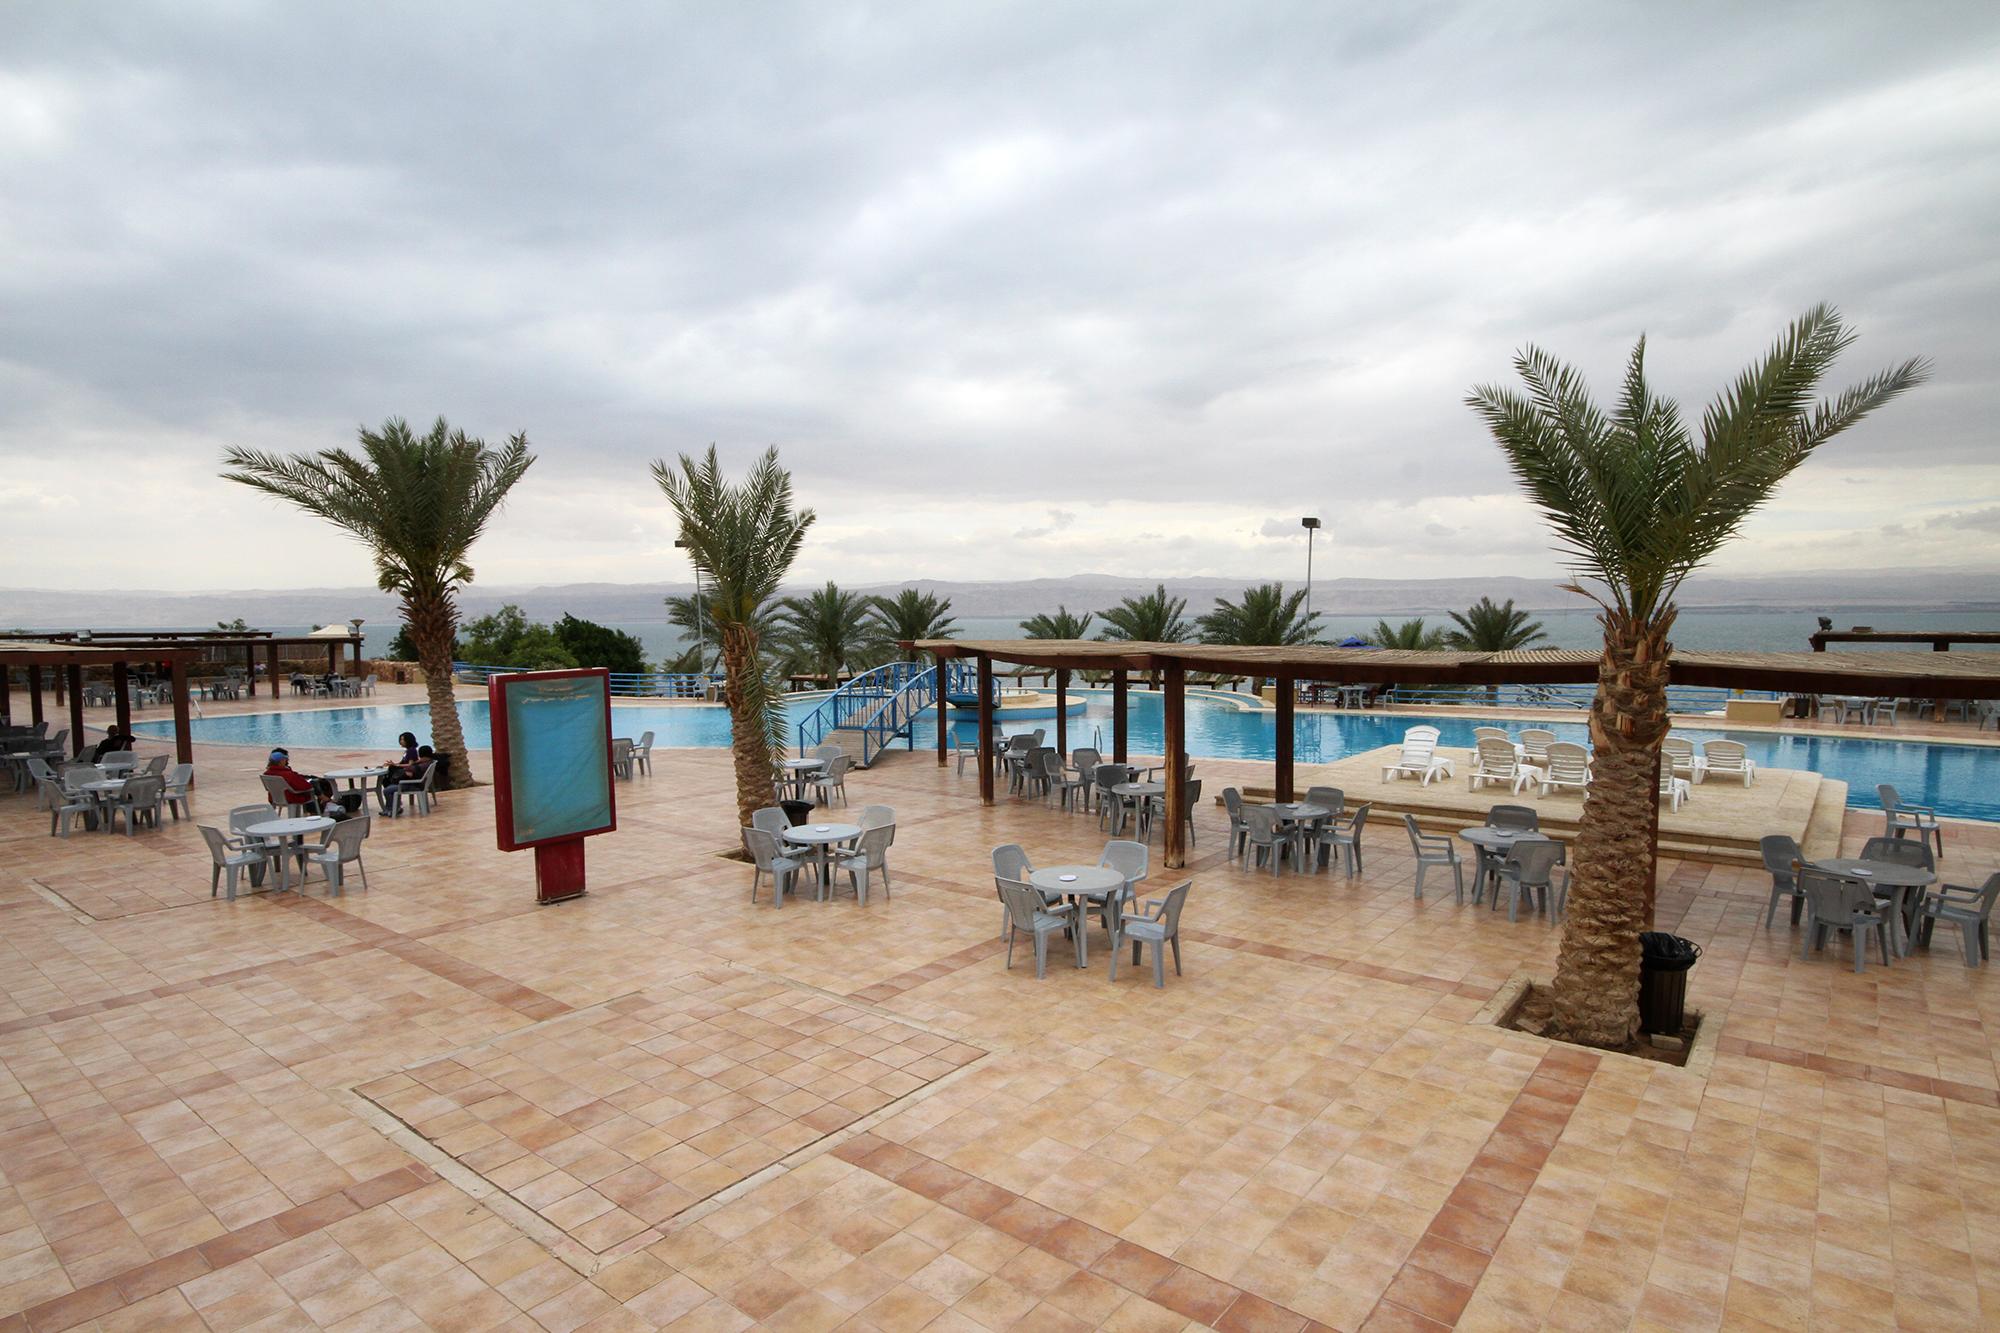 Amman Beach Resort